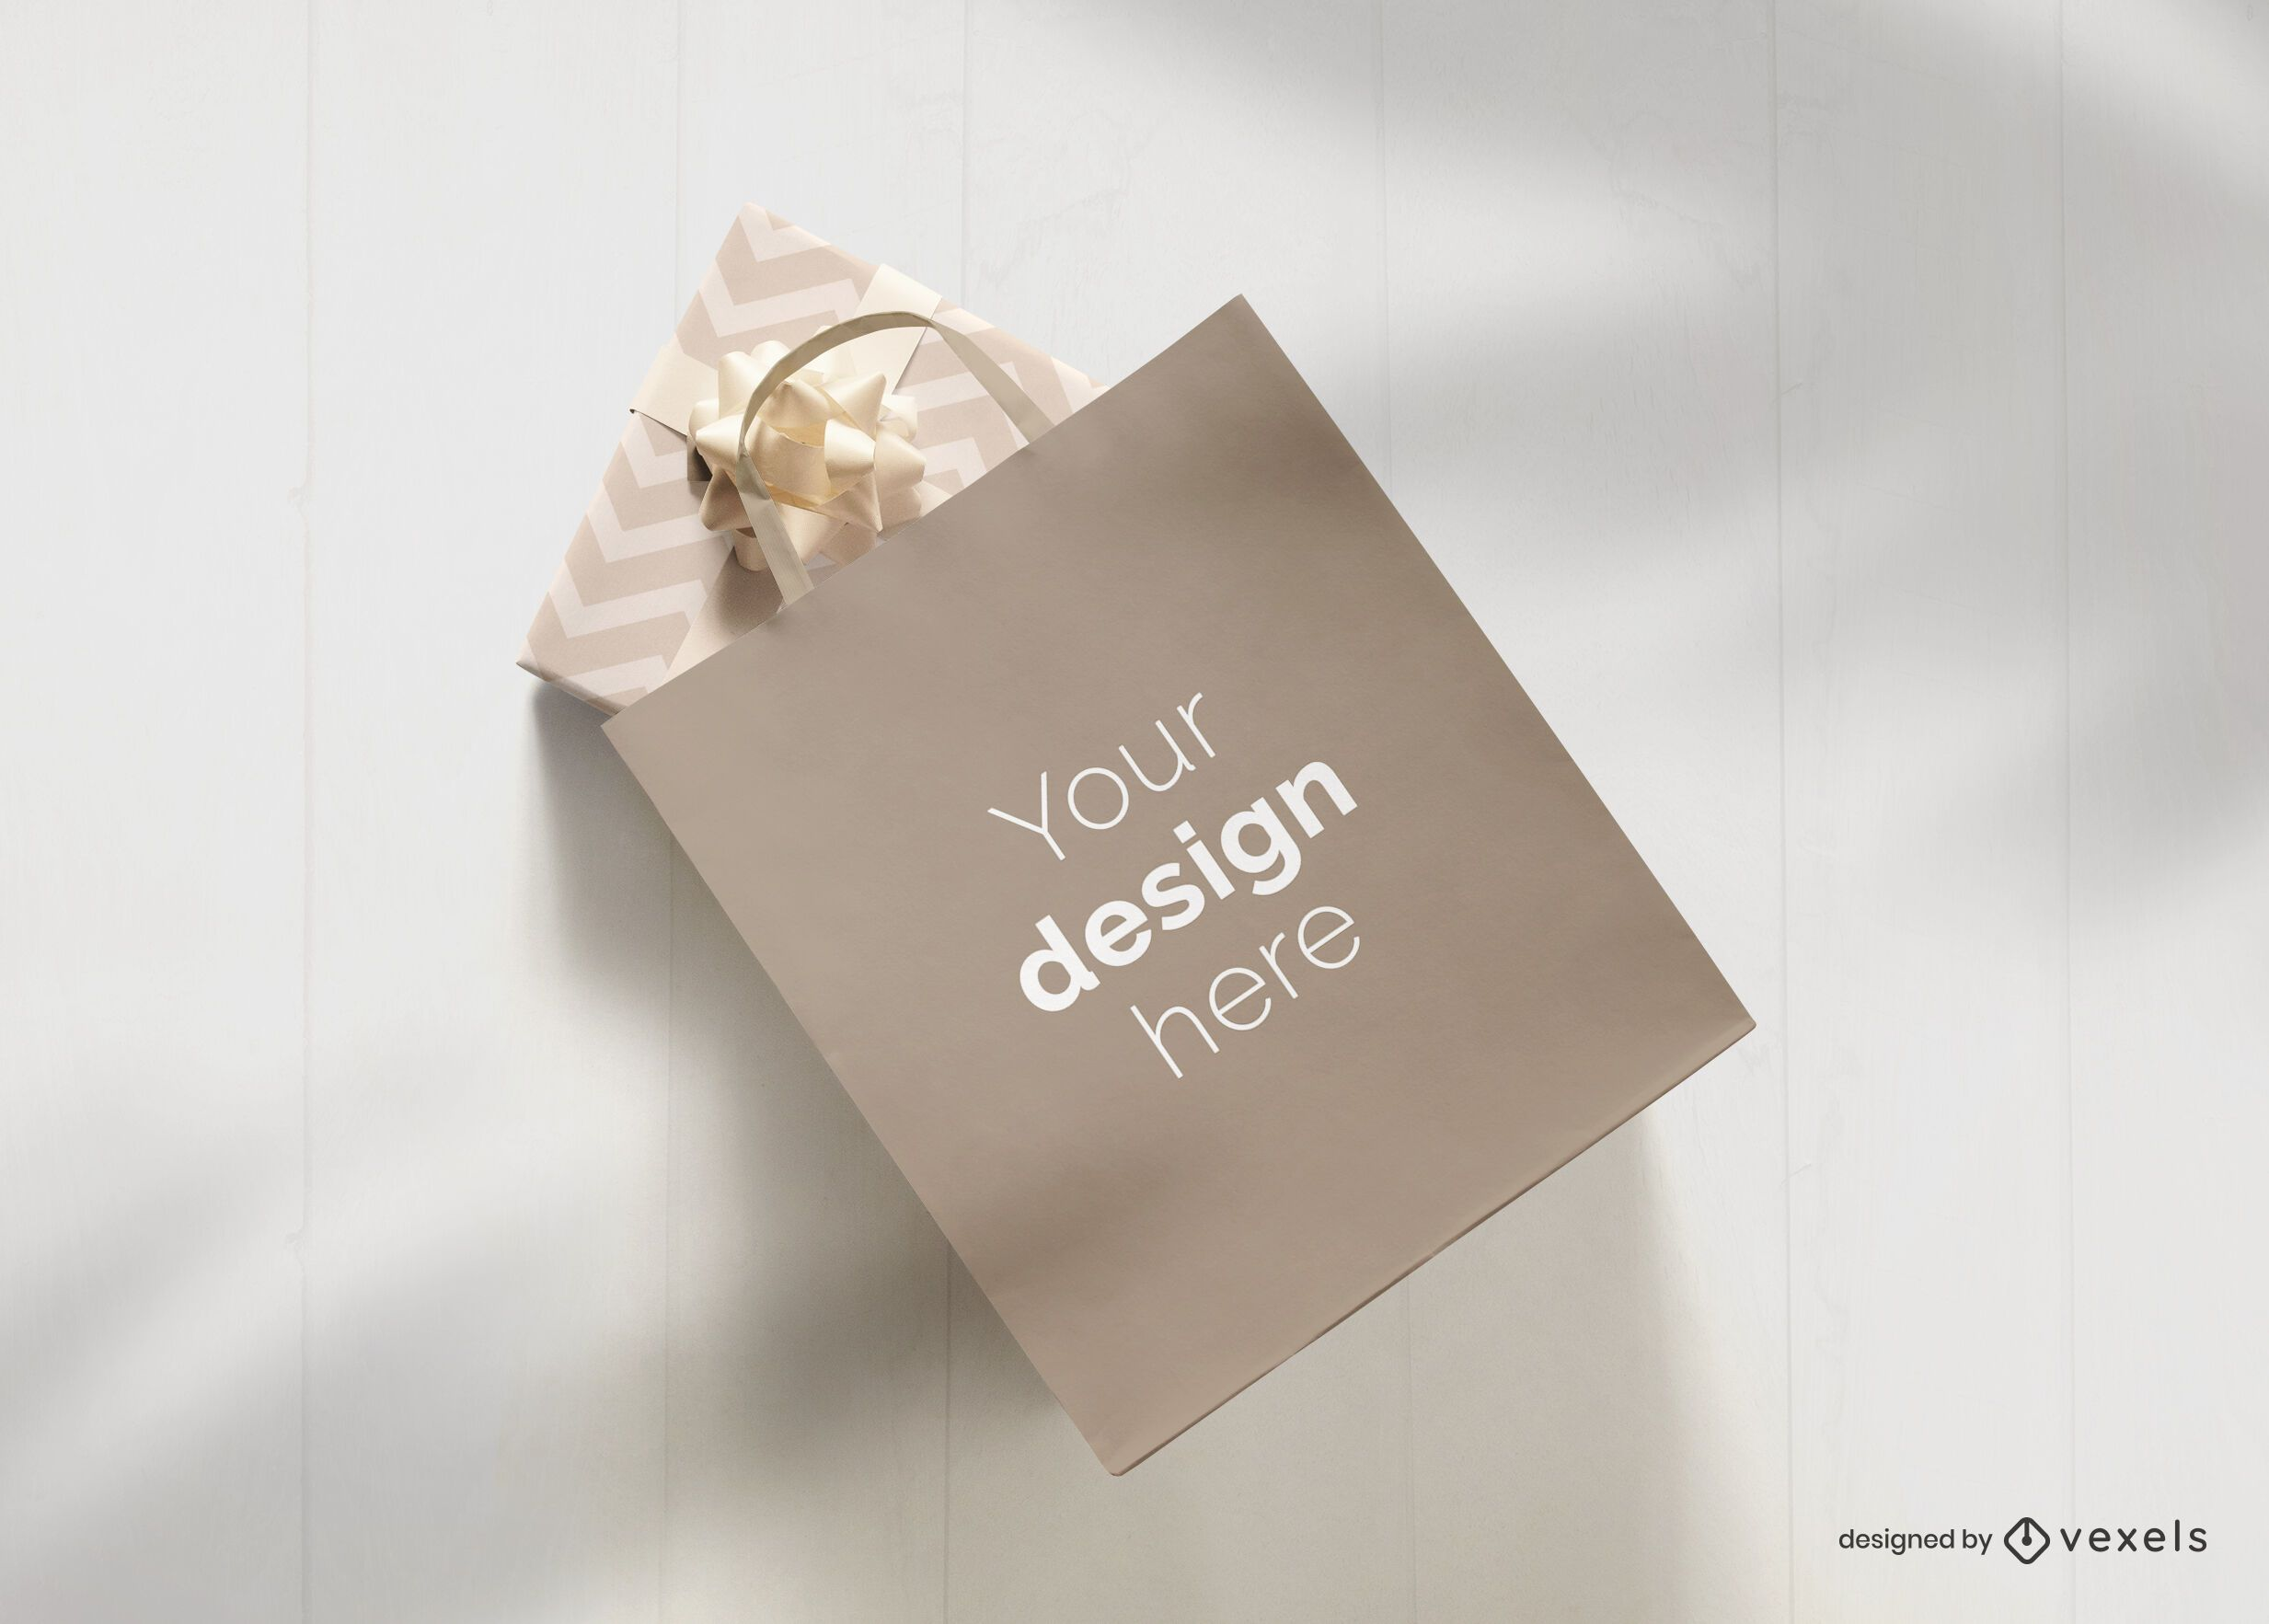 Bolsa de papel presente diseño de maqueta